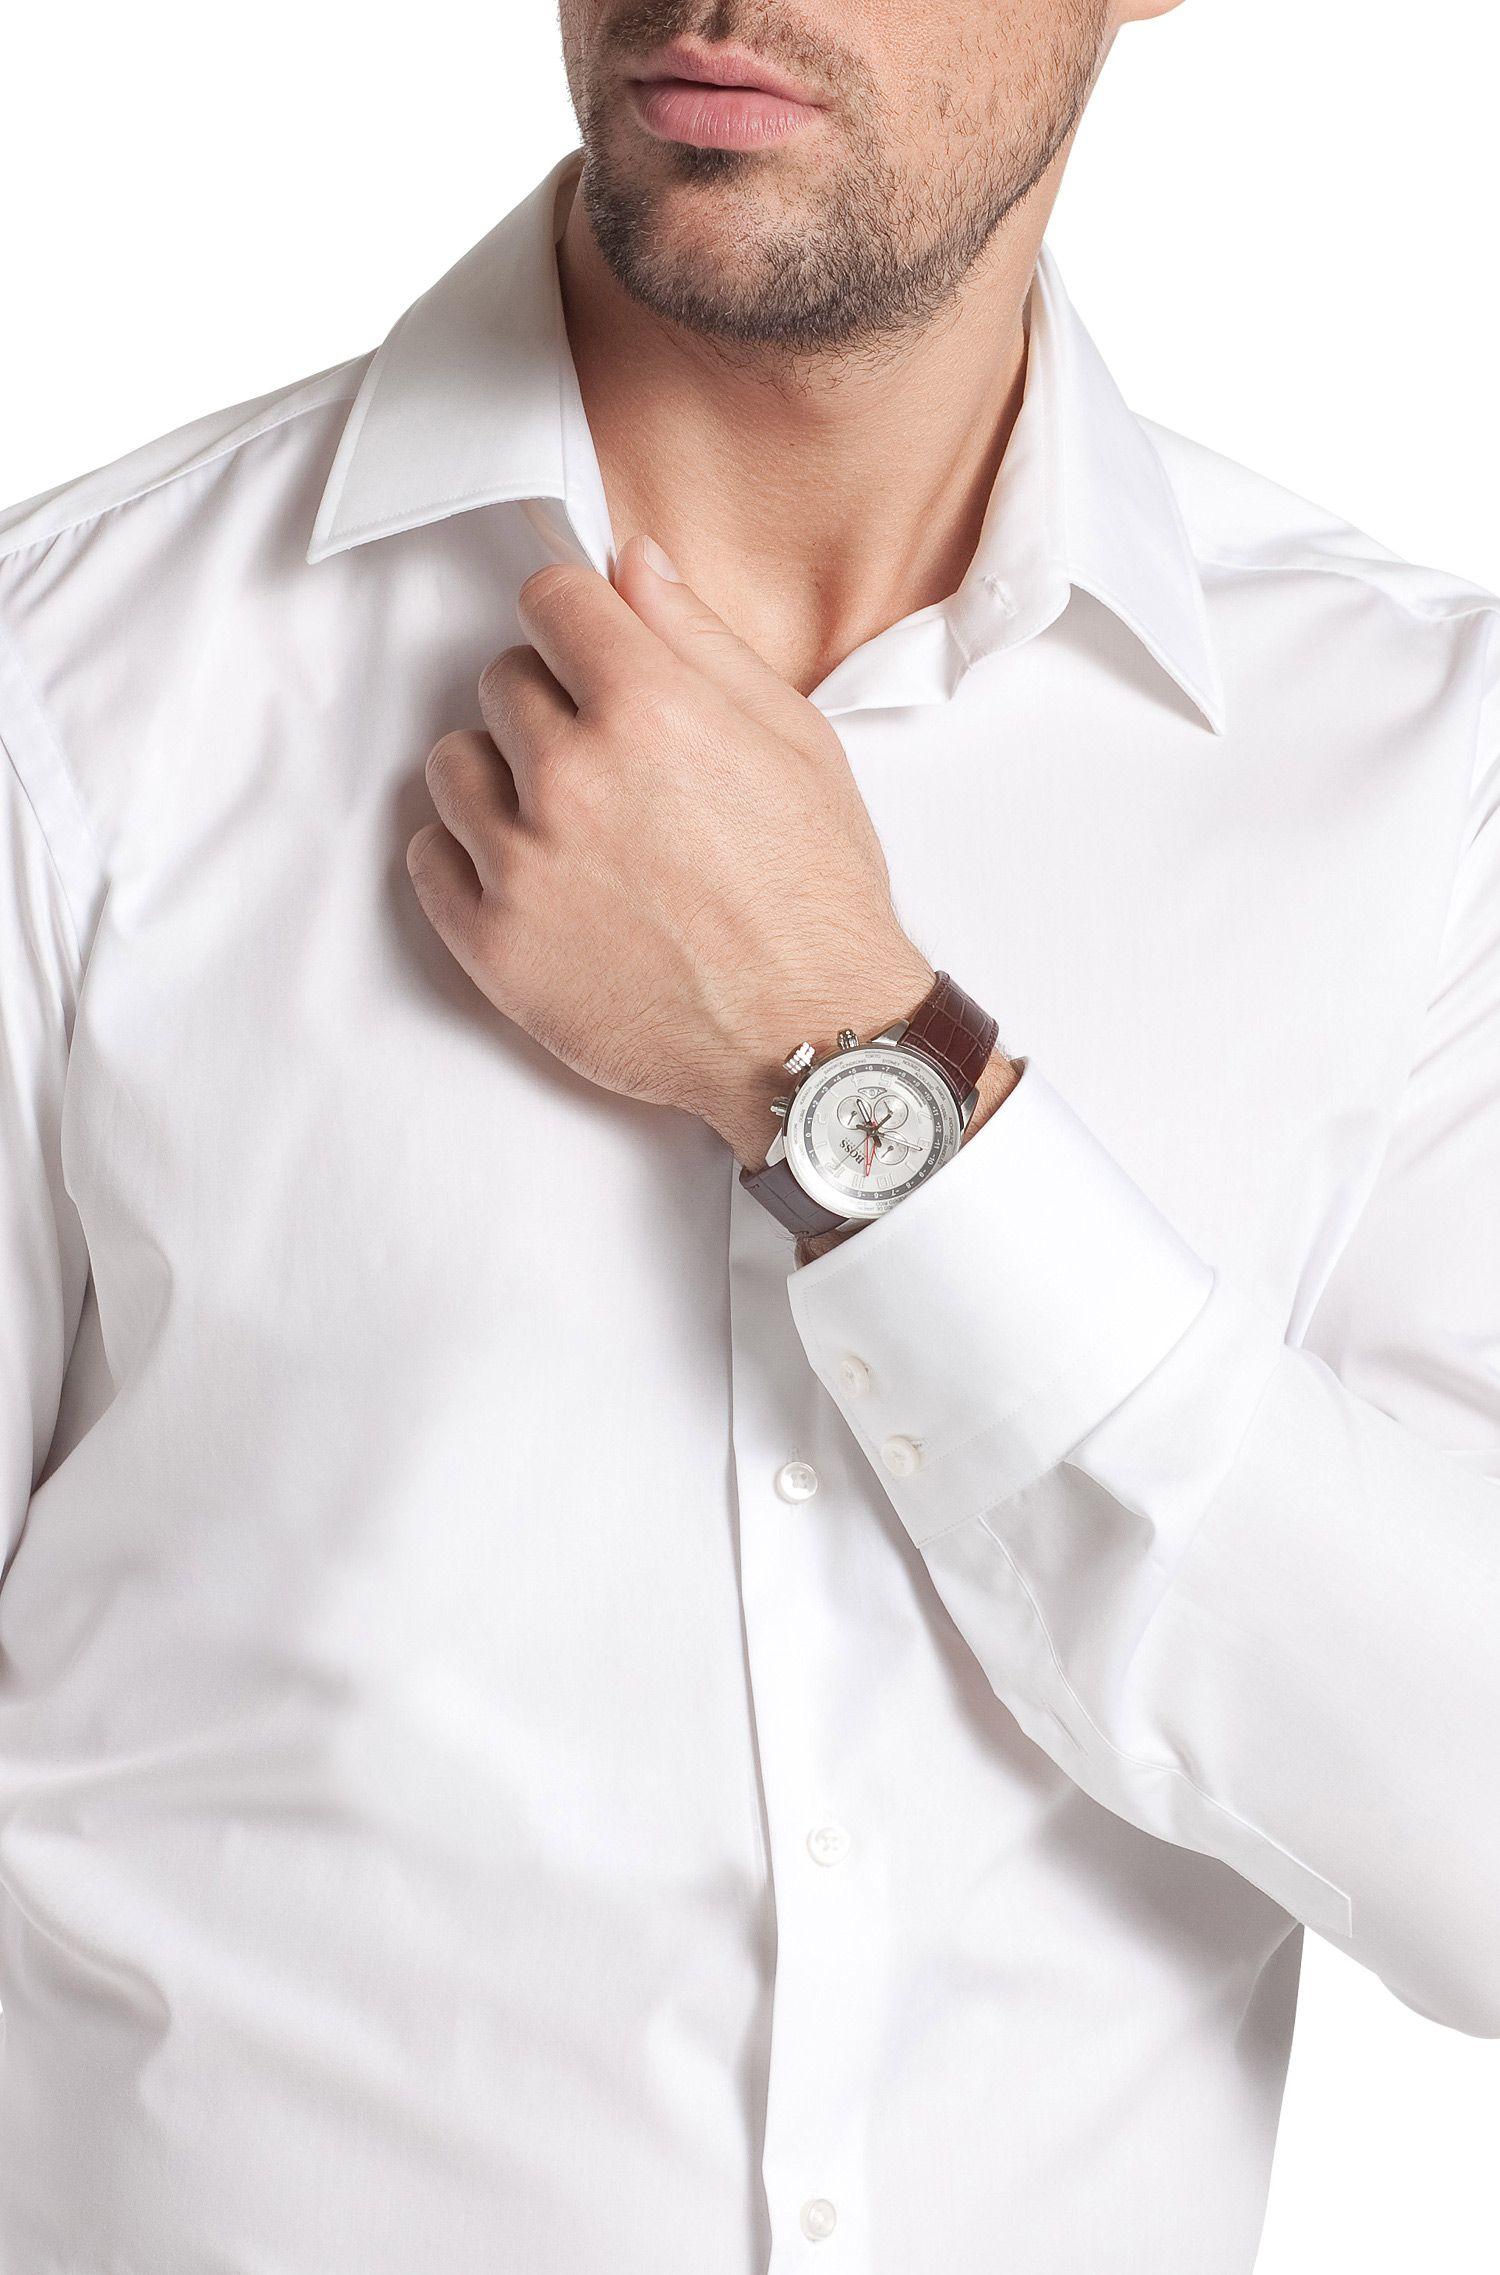 Herenchronograaf 'HB2031' met leren armband